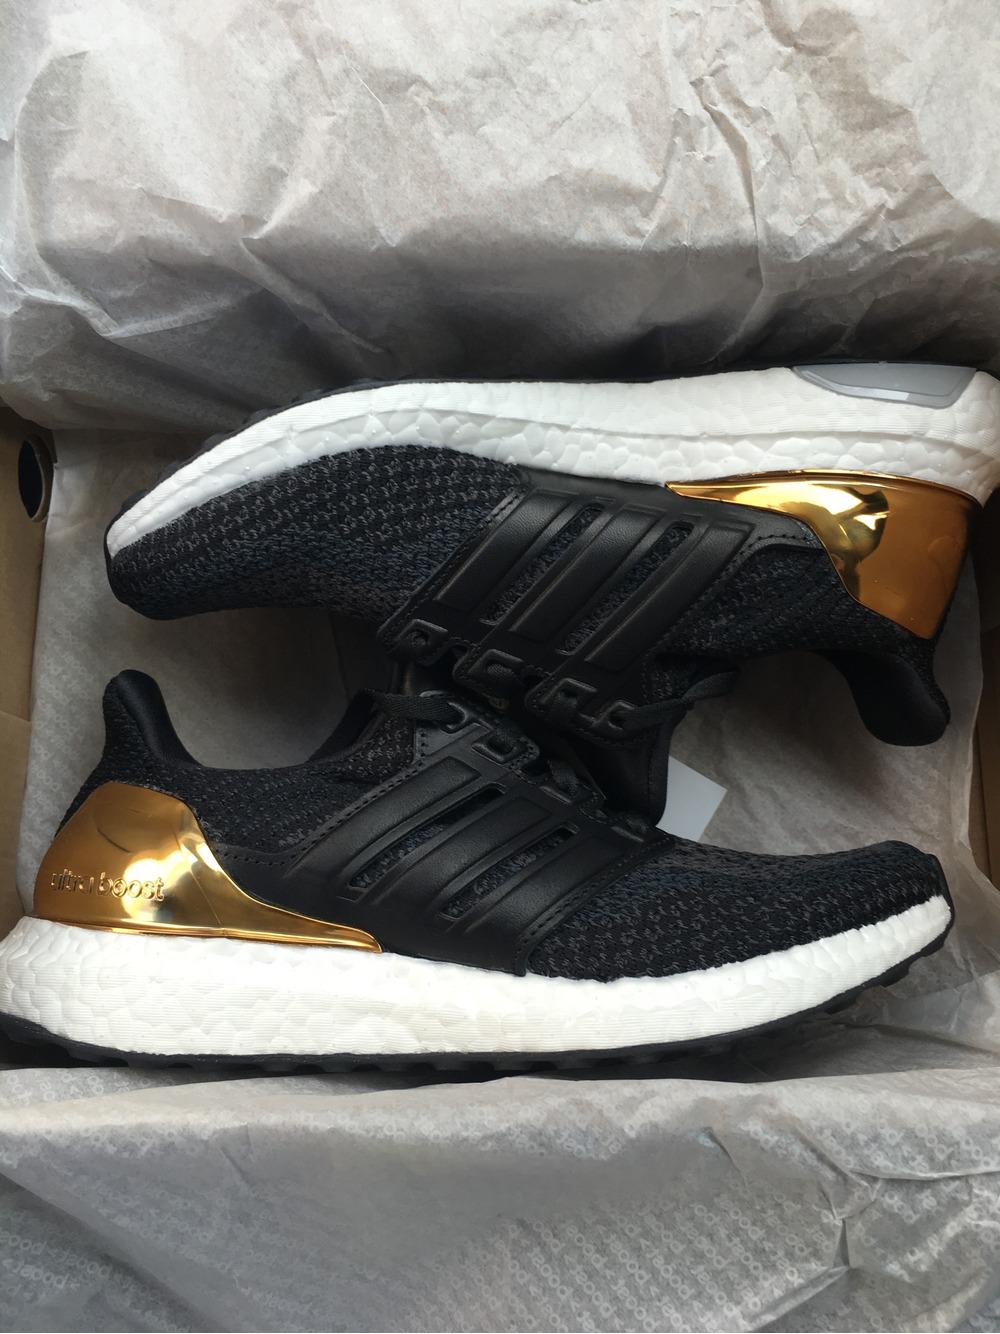 adidas ultra boost mens gold